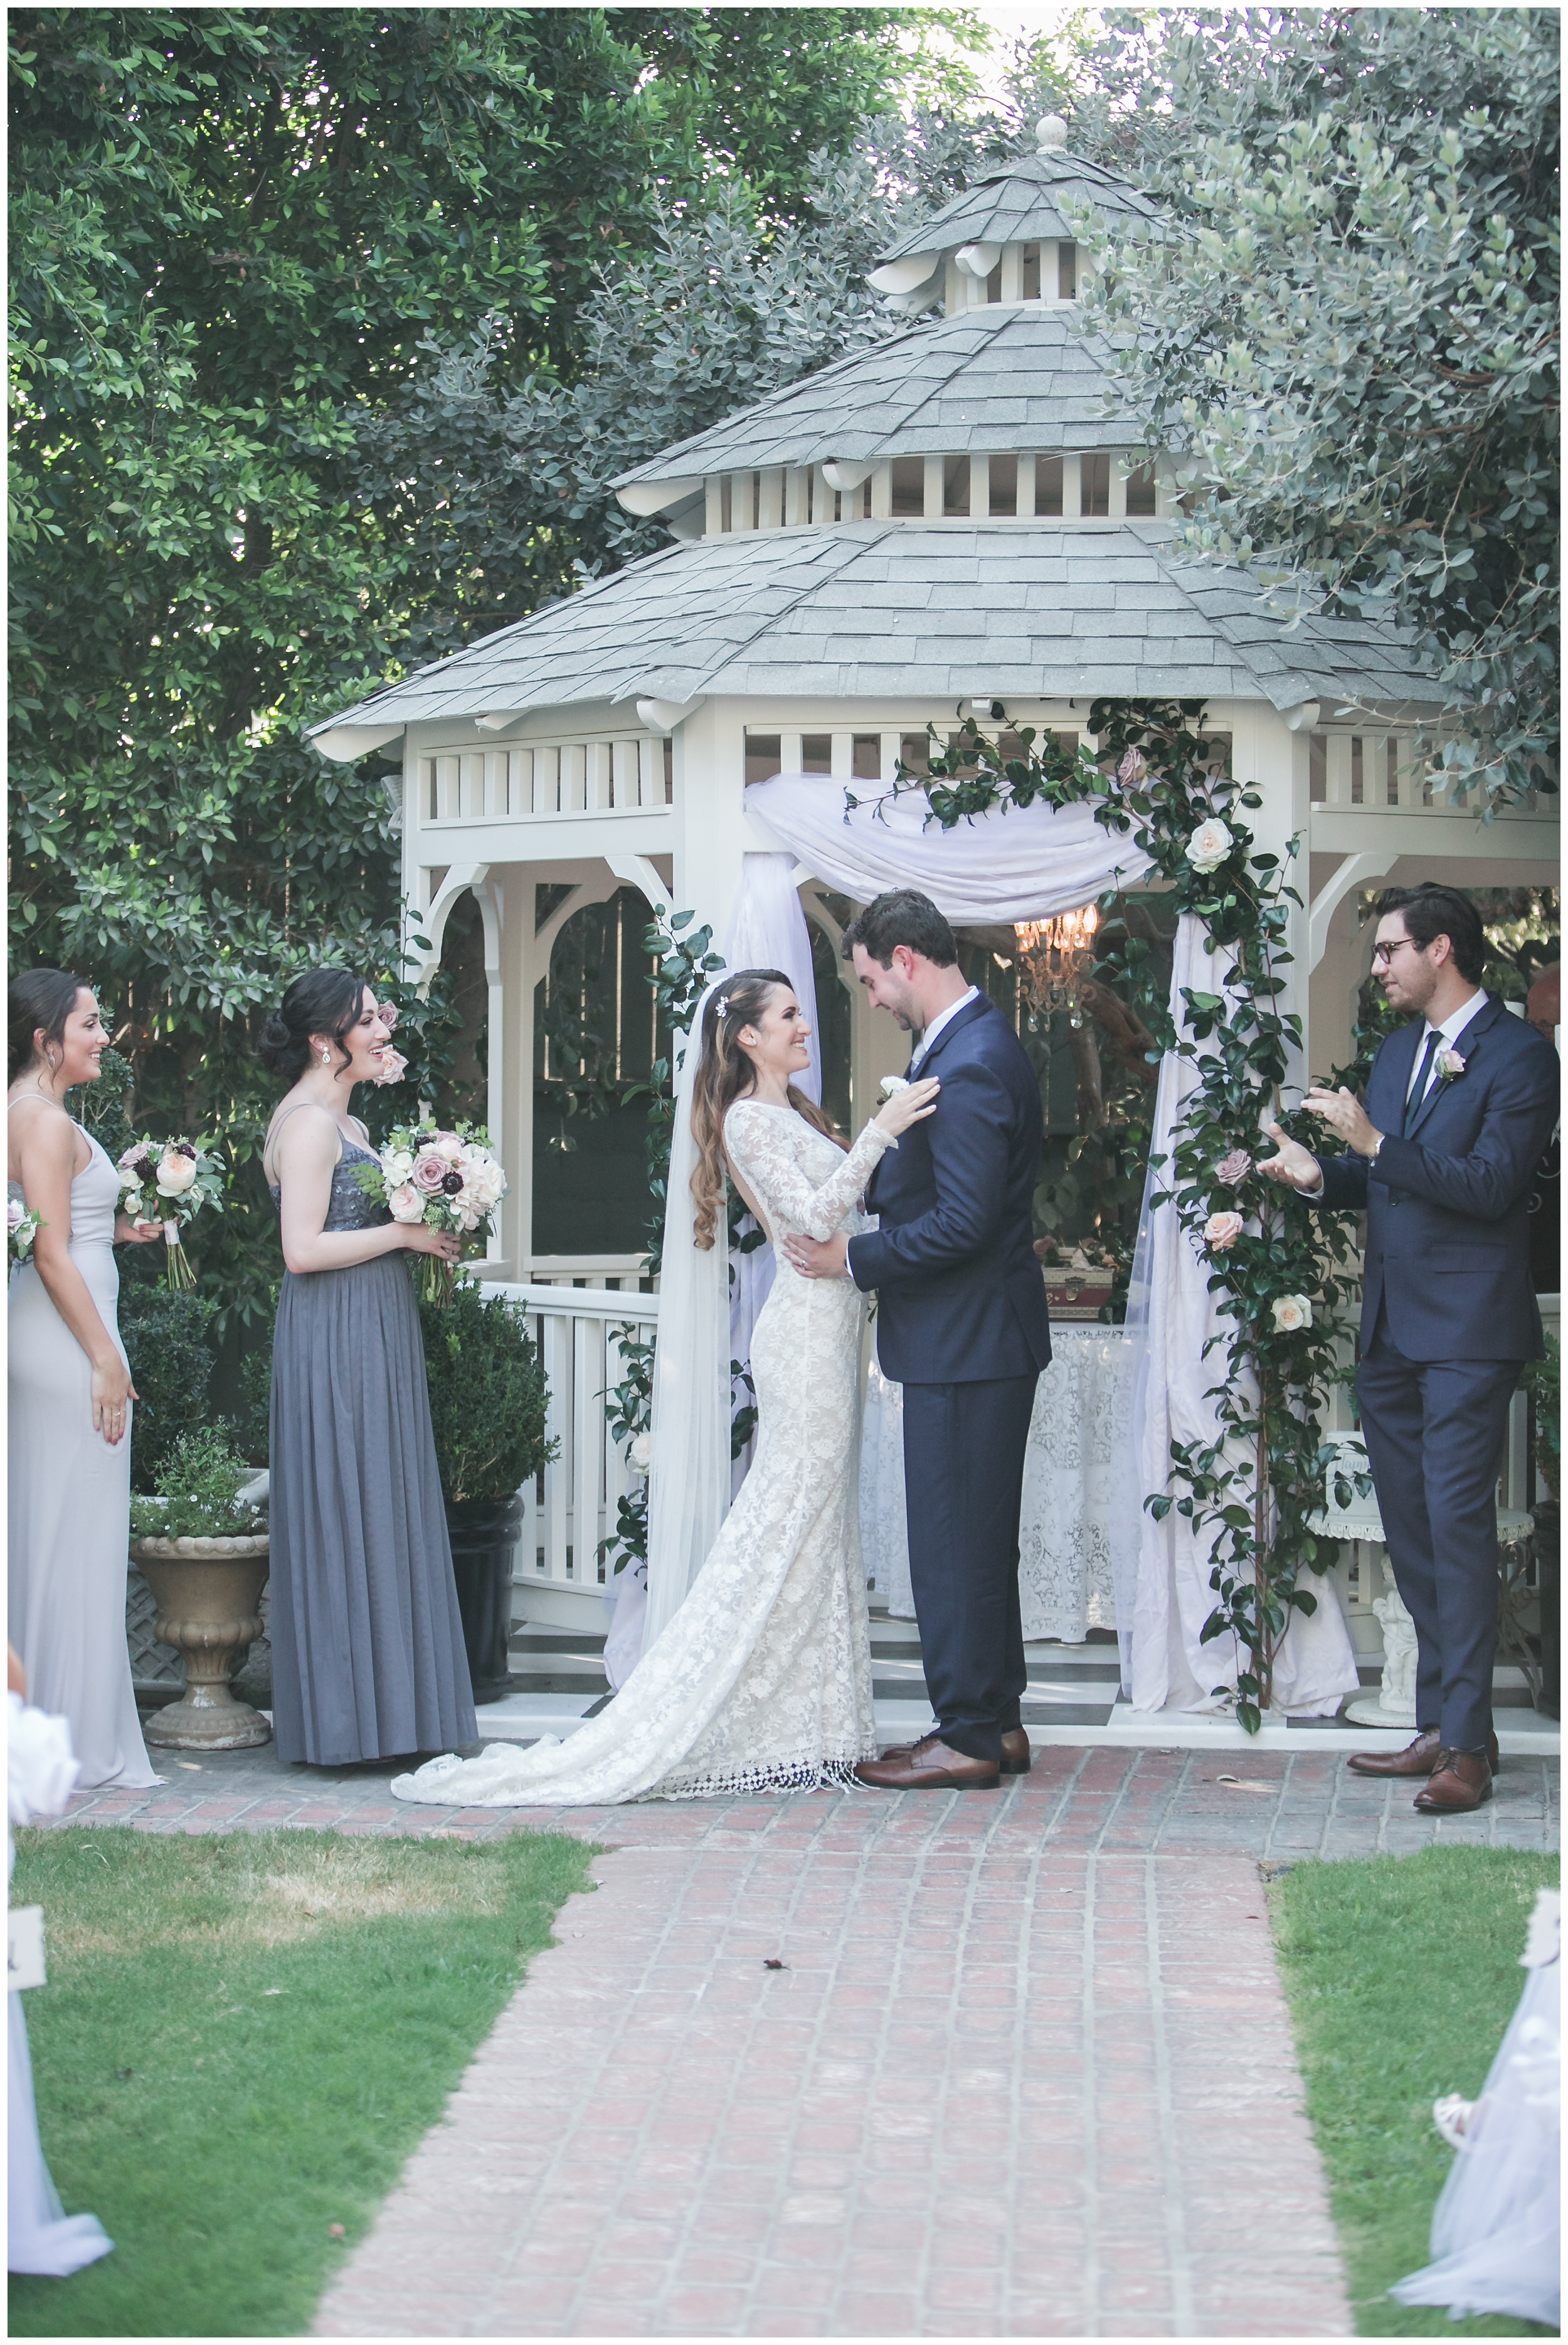 chic-christmas-house-wedding-ceremony-carrie-vines-014.jpg